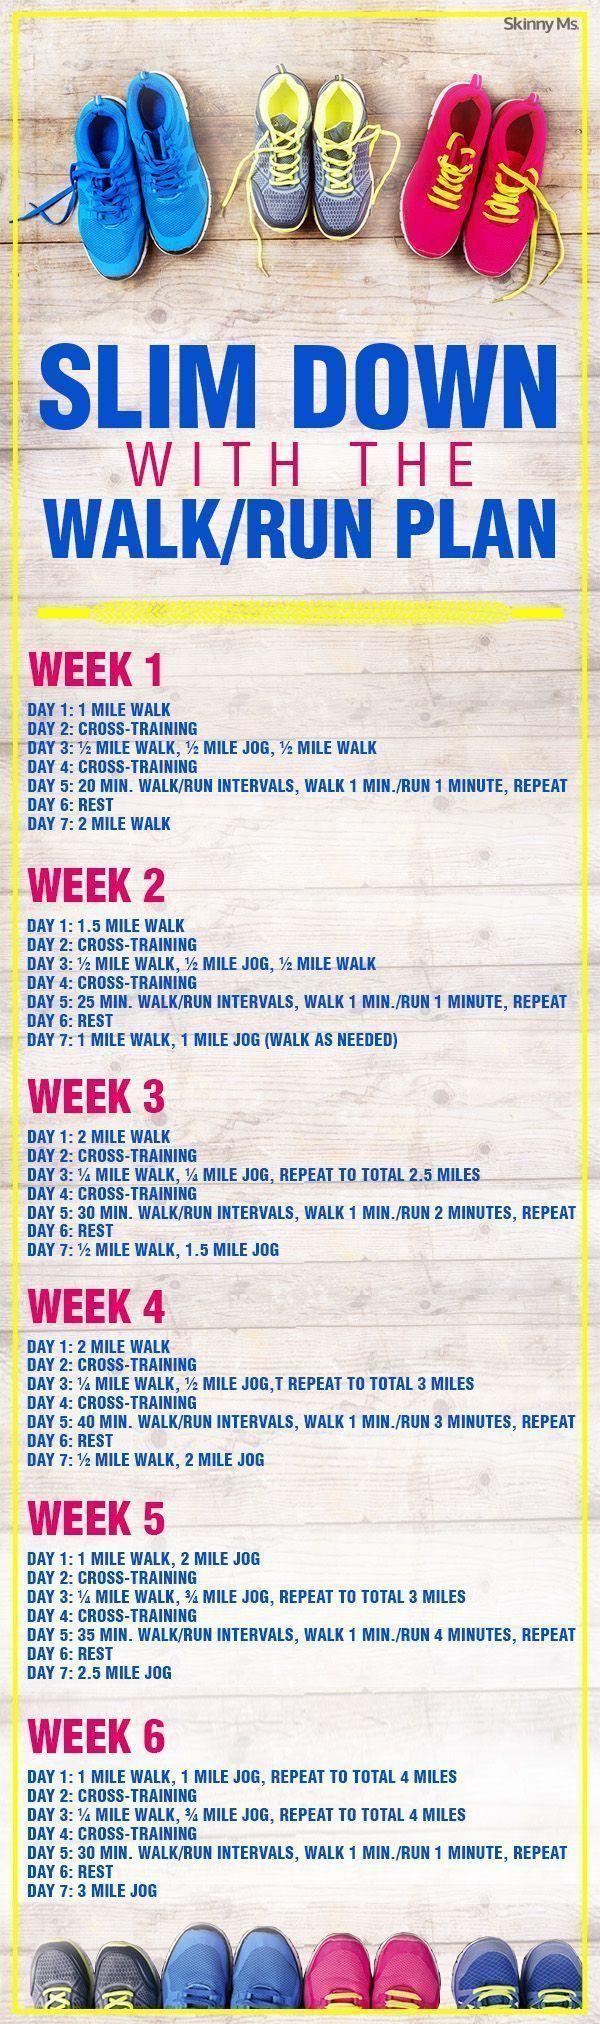 Forum on this topic: 7-Day WalkRun Challenge, 7-day-walkrun-challenge/